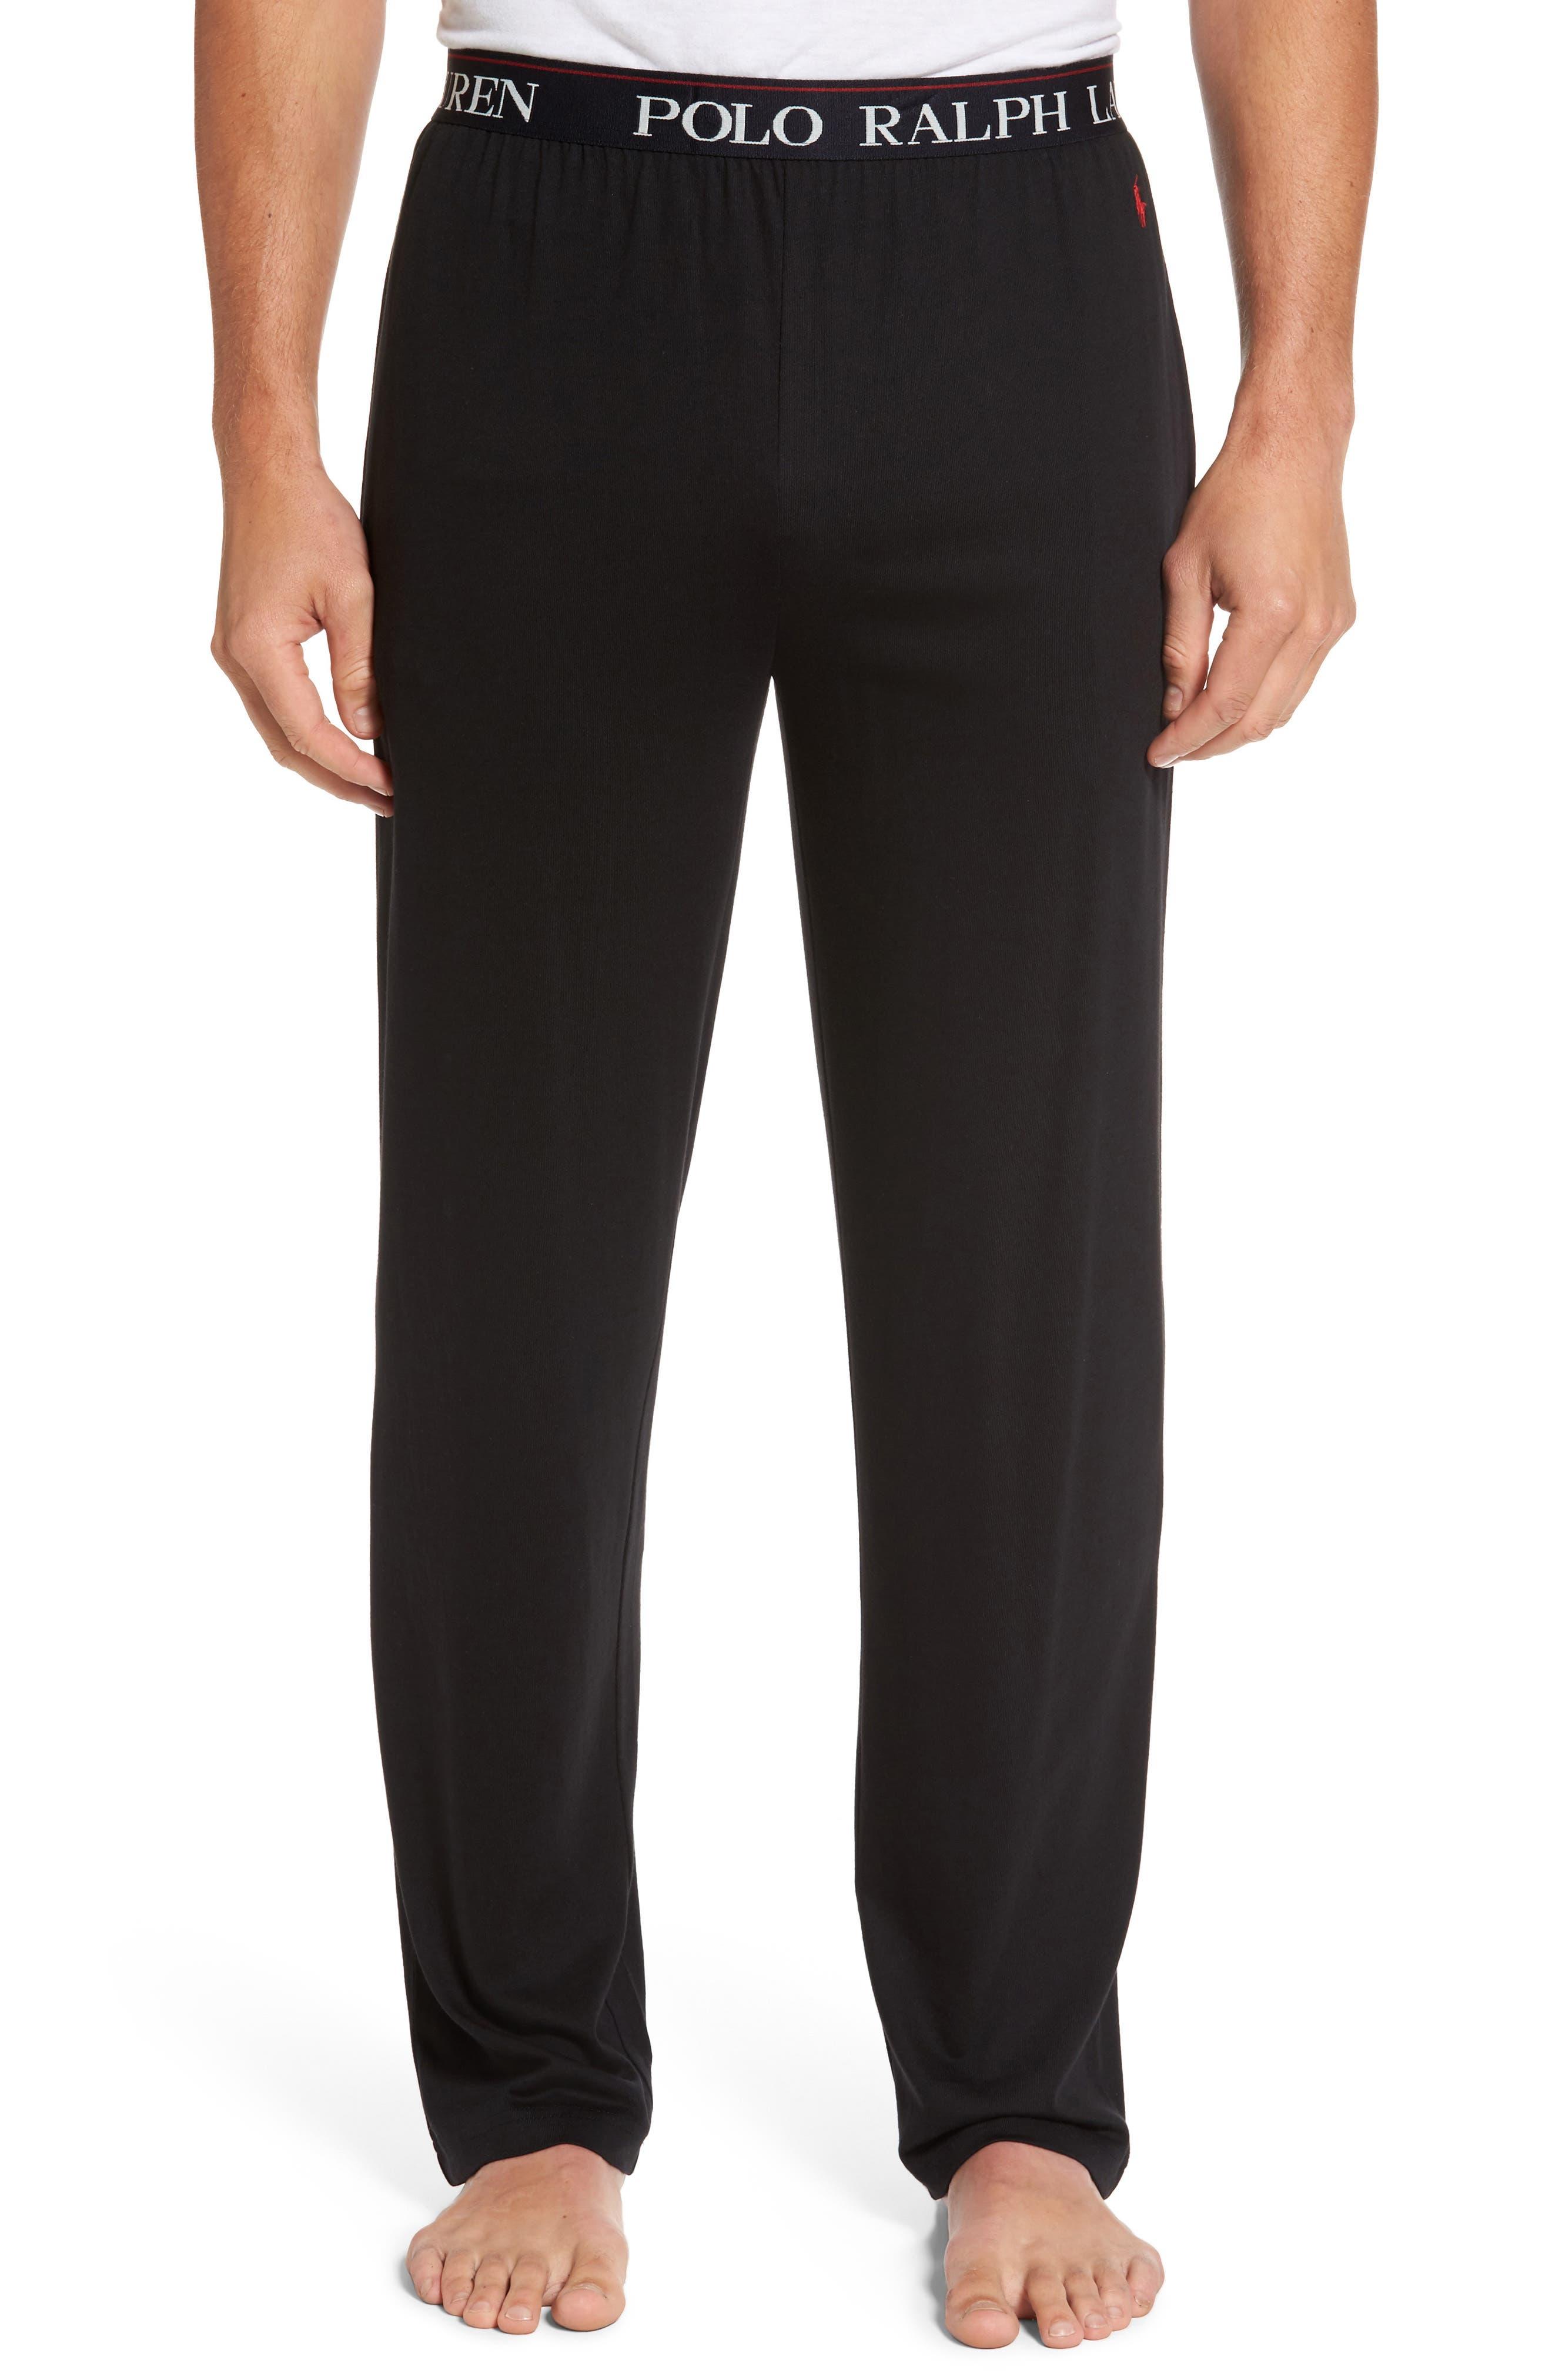 Cotton & Modal Lounge Pants,                             Main thumbnail 1, color,                             POLO BLACK